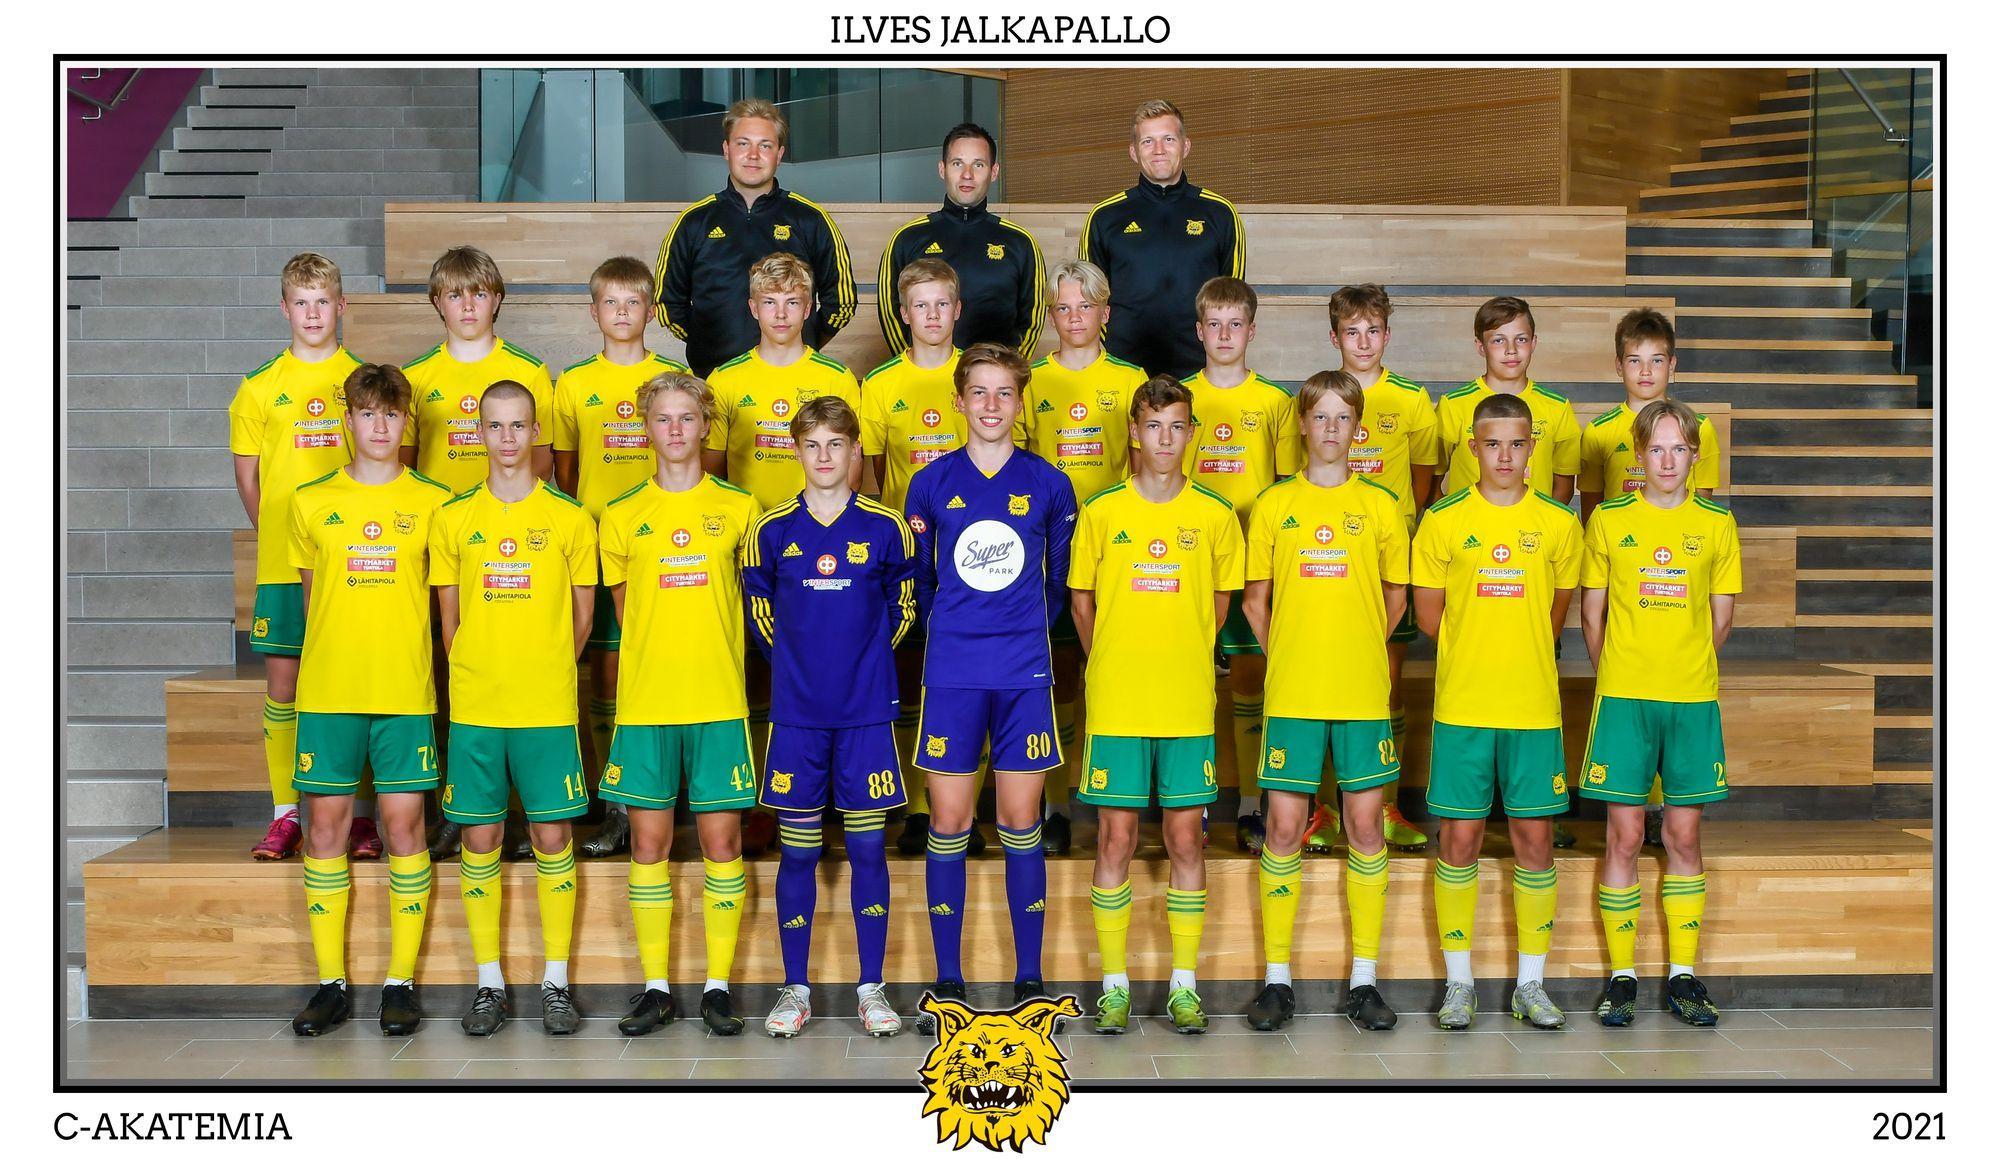 Ilves210621 KLK 5 ilves jalkapallo c akatemia Urheilukuvaus